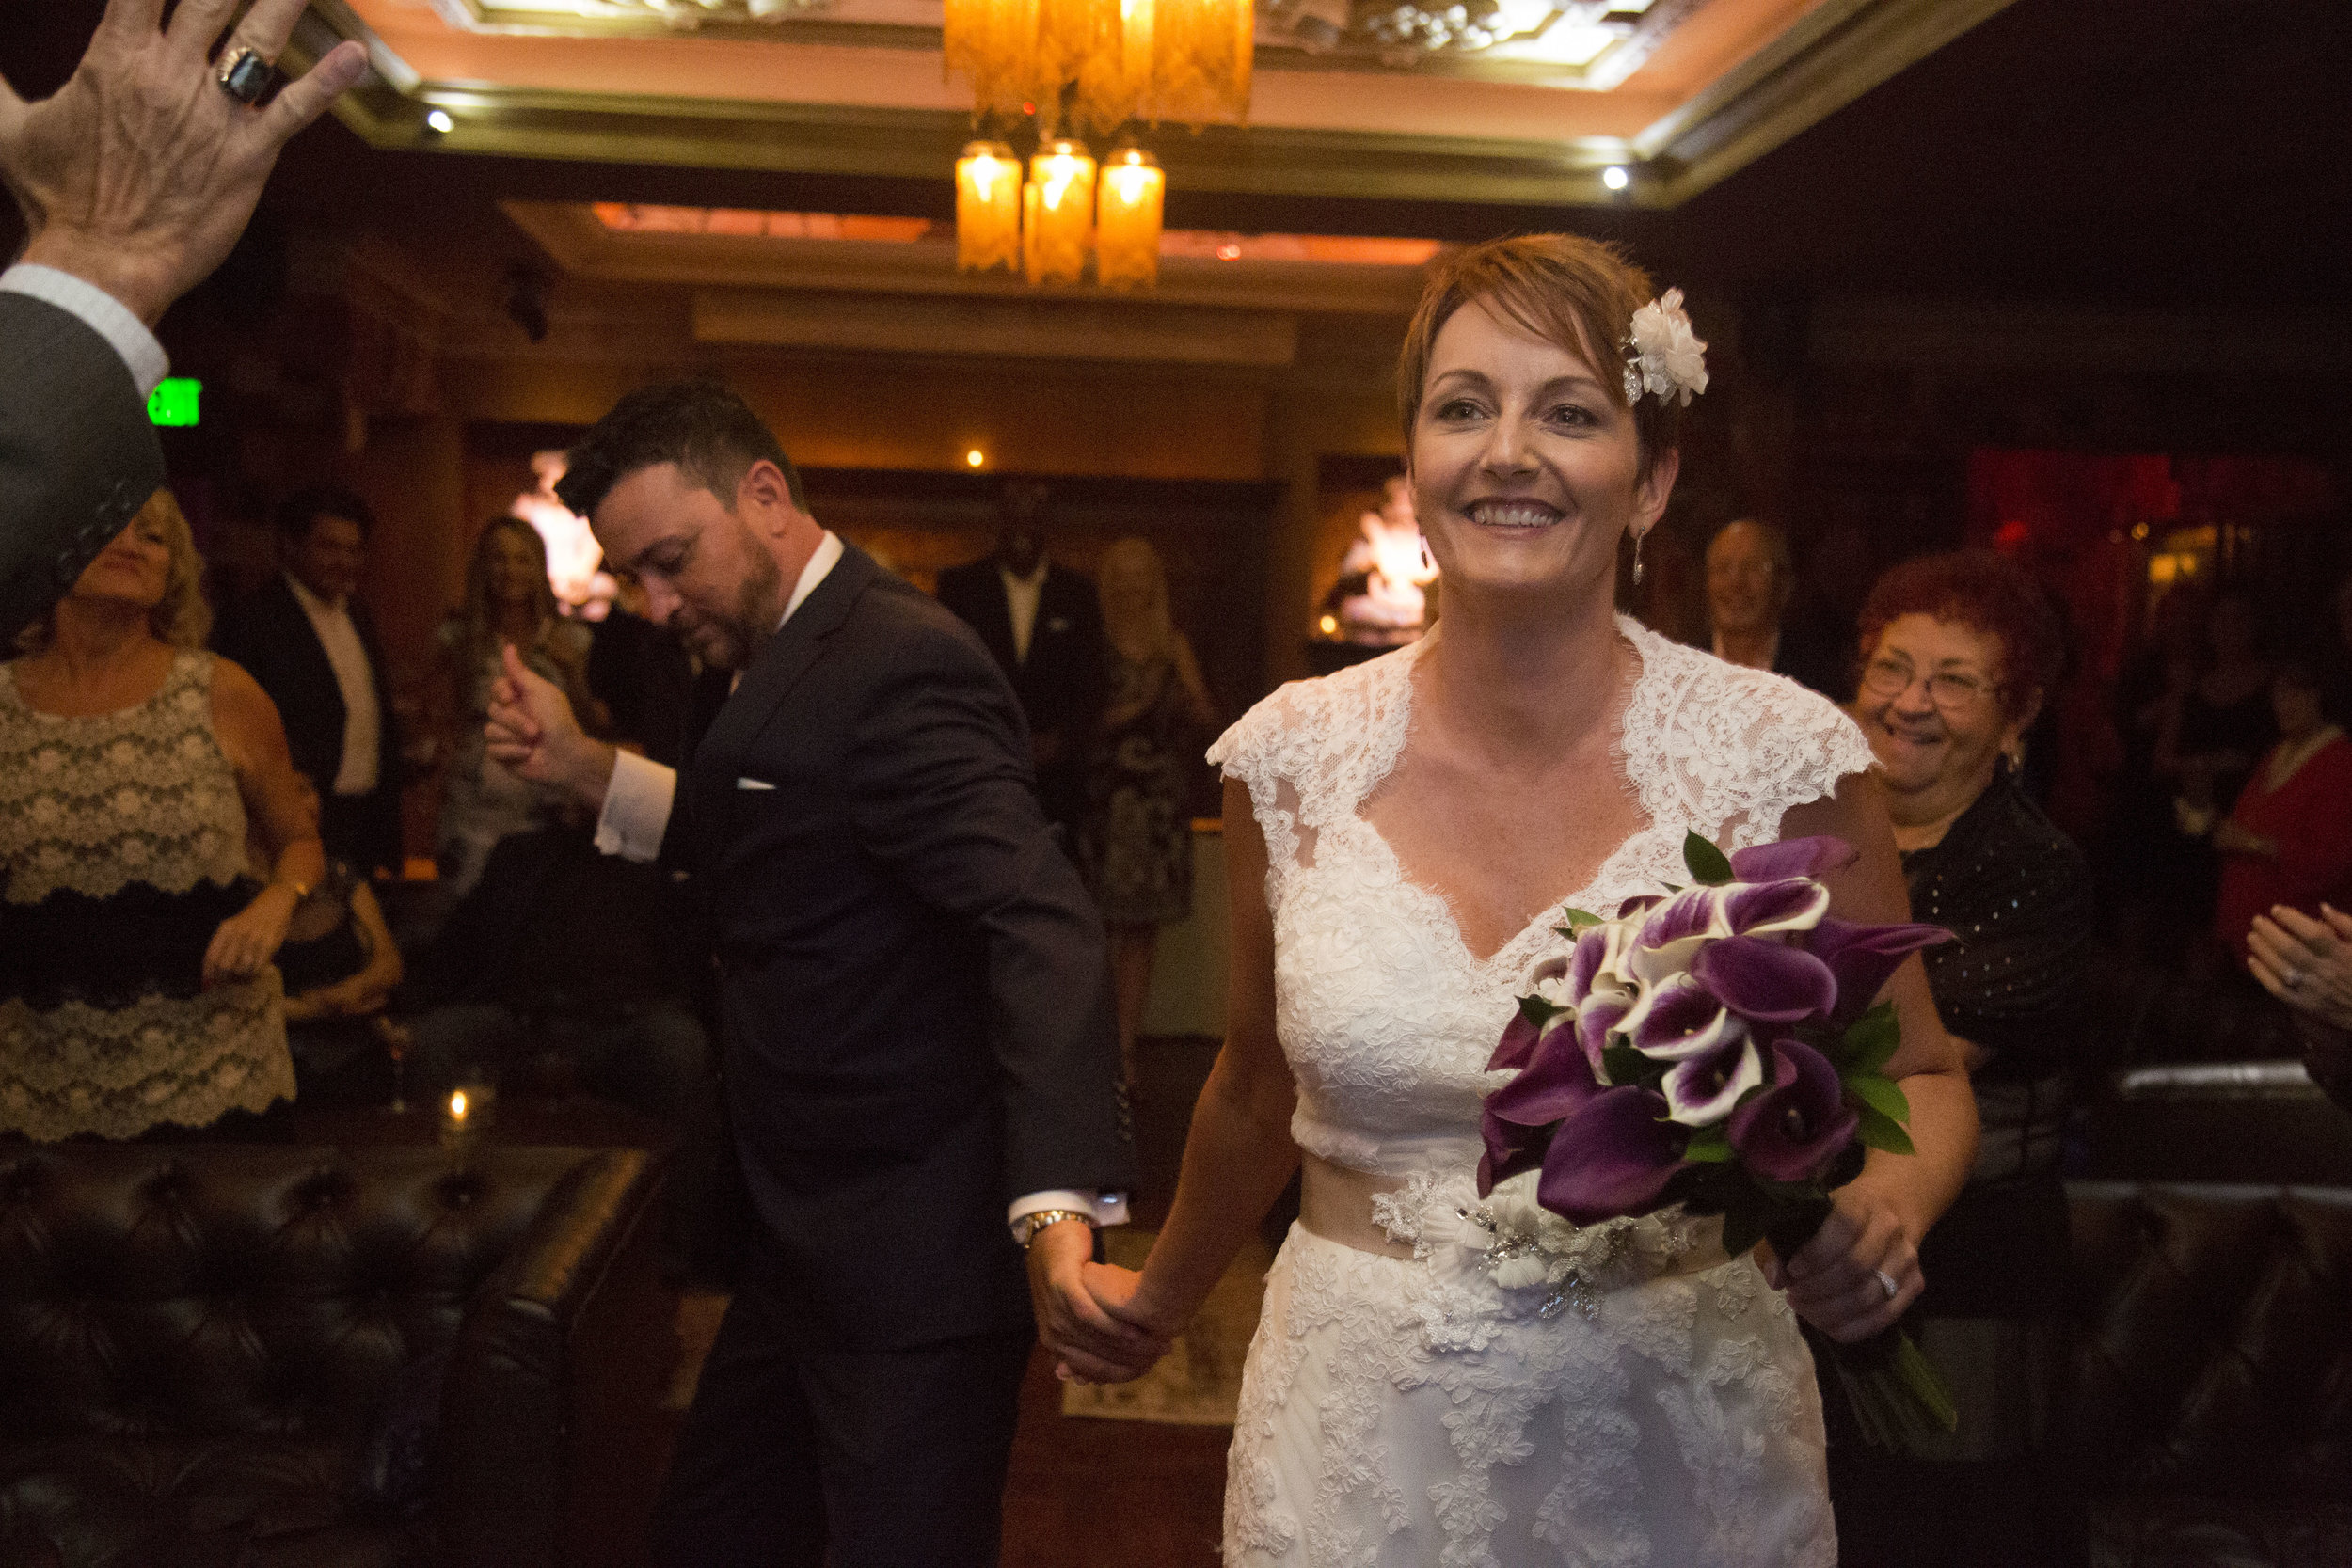 ATGI_Kat and Gabe Wedding 2016_2S8A5666.jpg